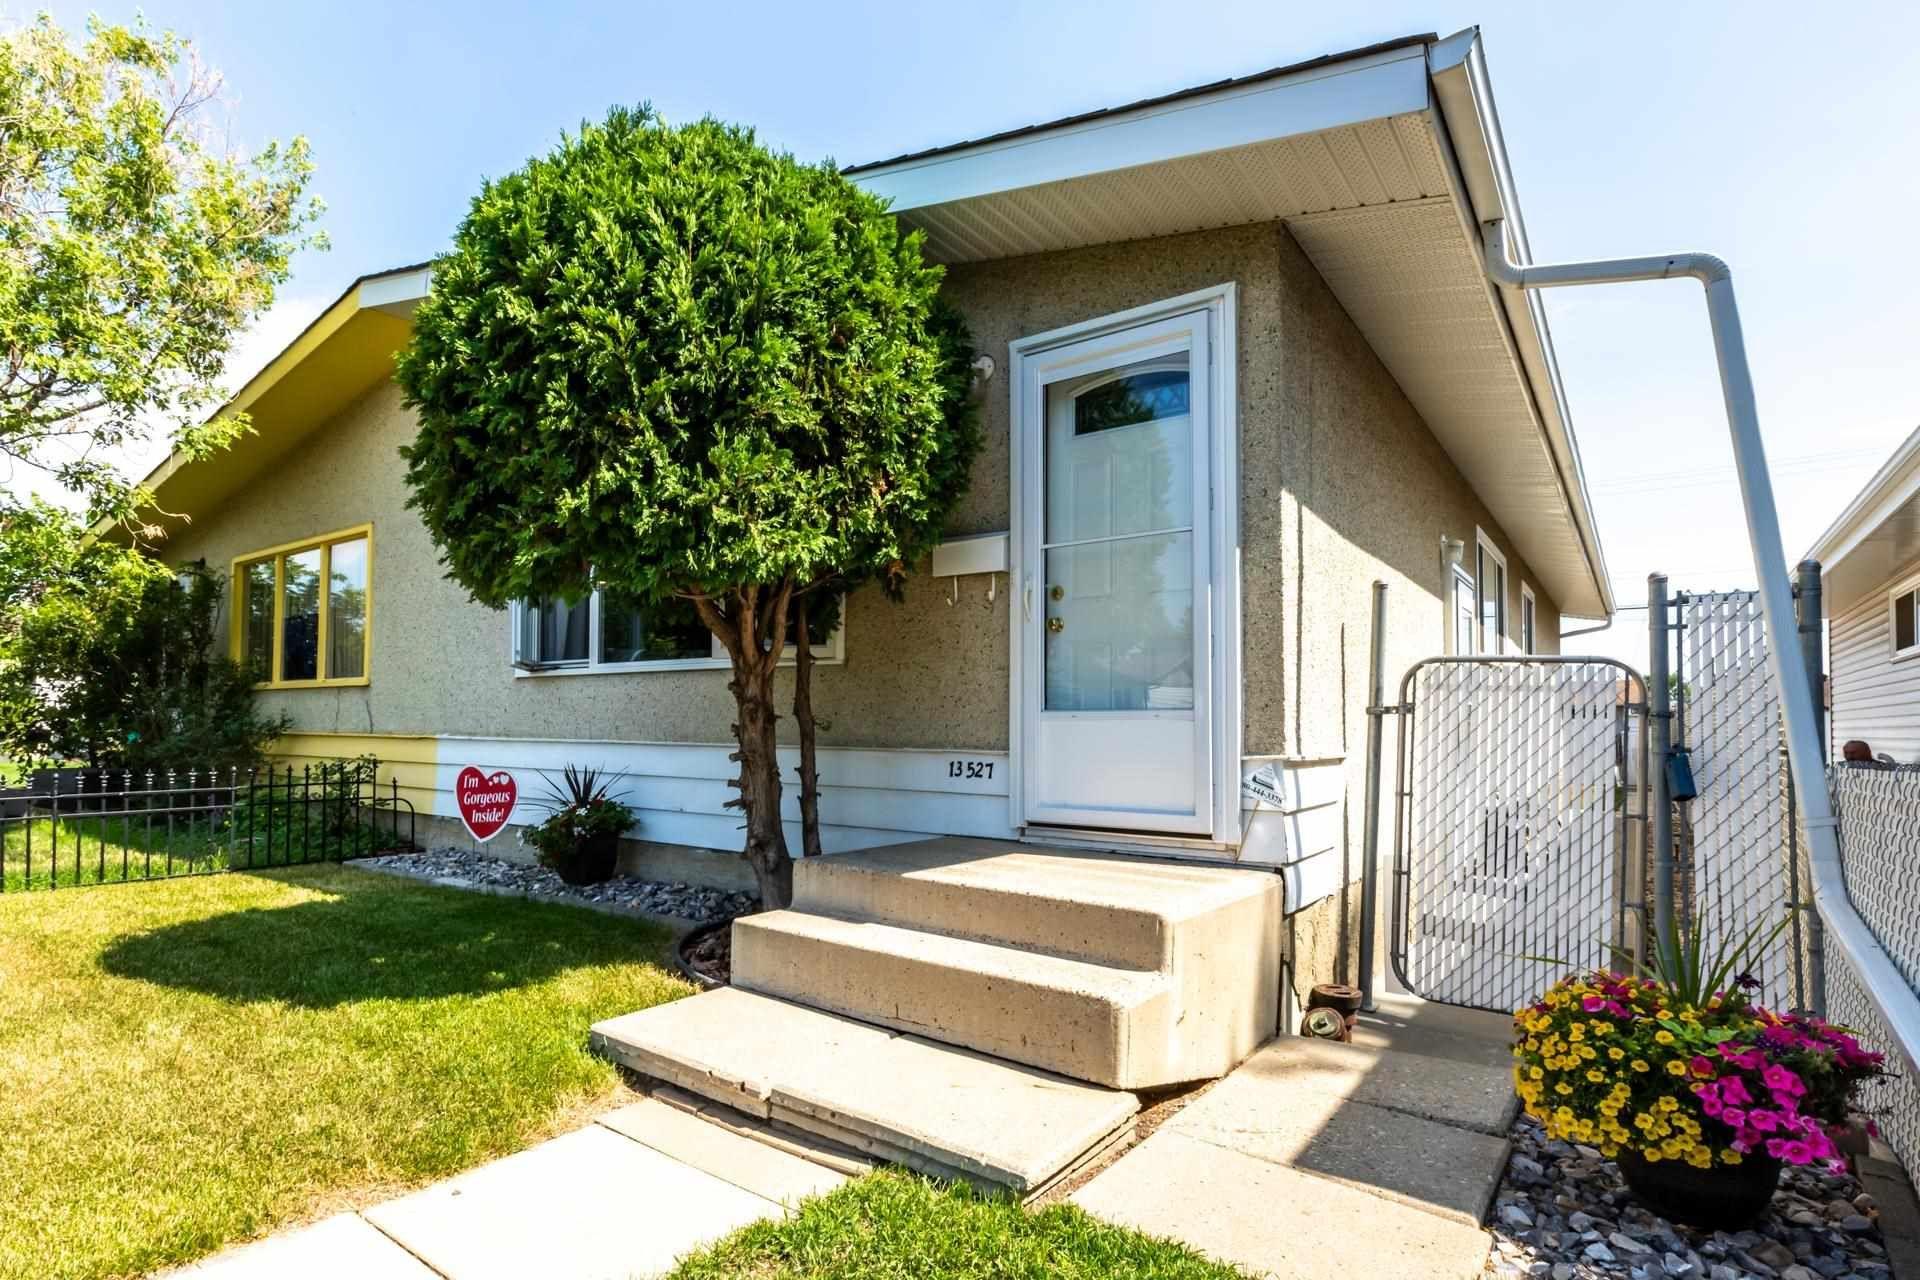 Main Photo: 13527 119 Street in Edmonton: Zone 01 House Half Duplex for sale : MLS®# E4257040